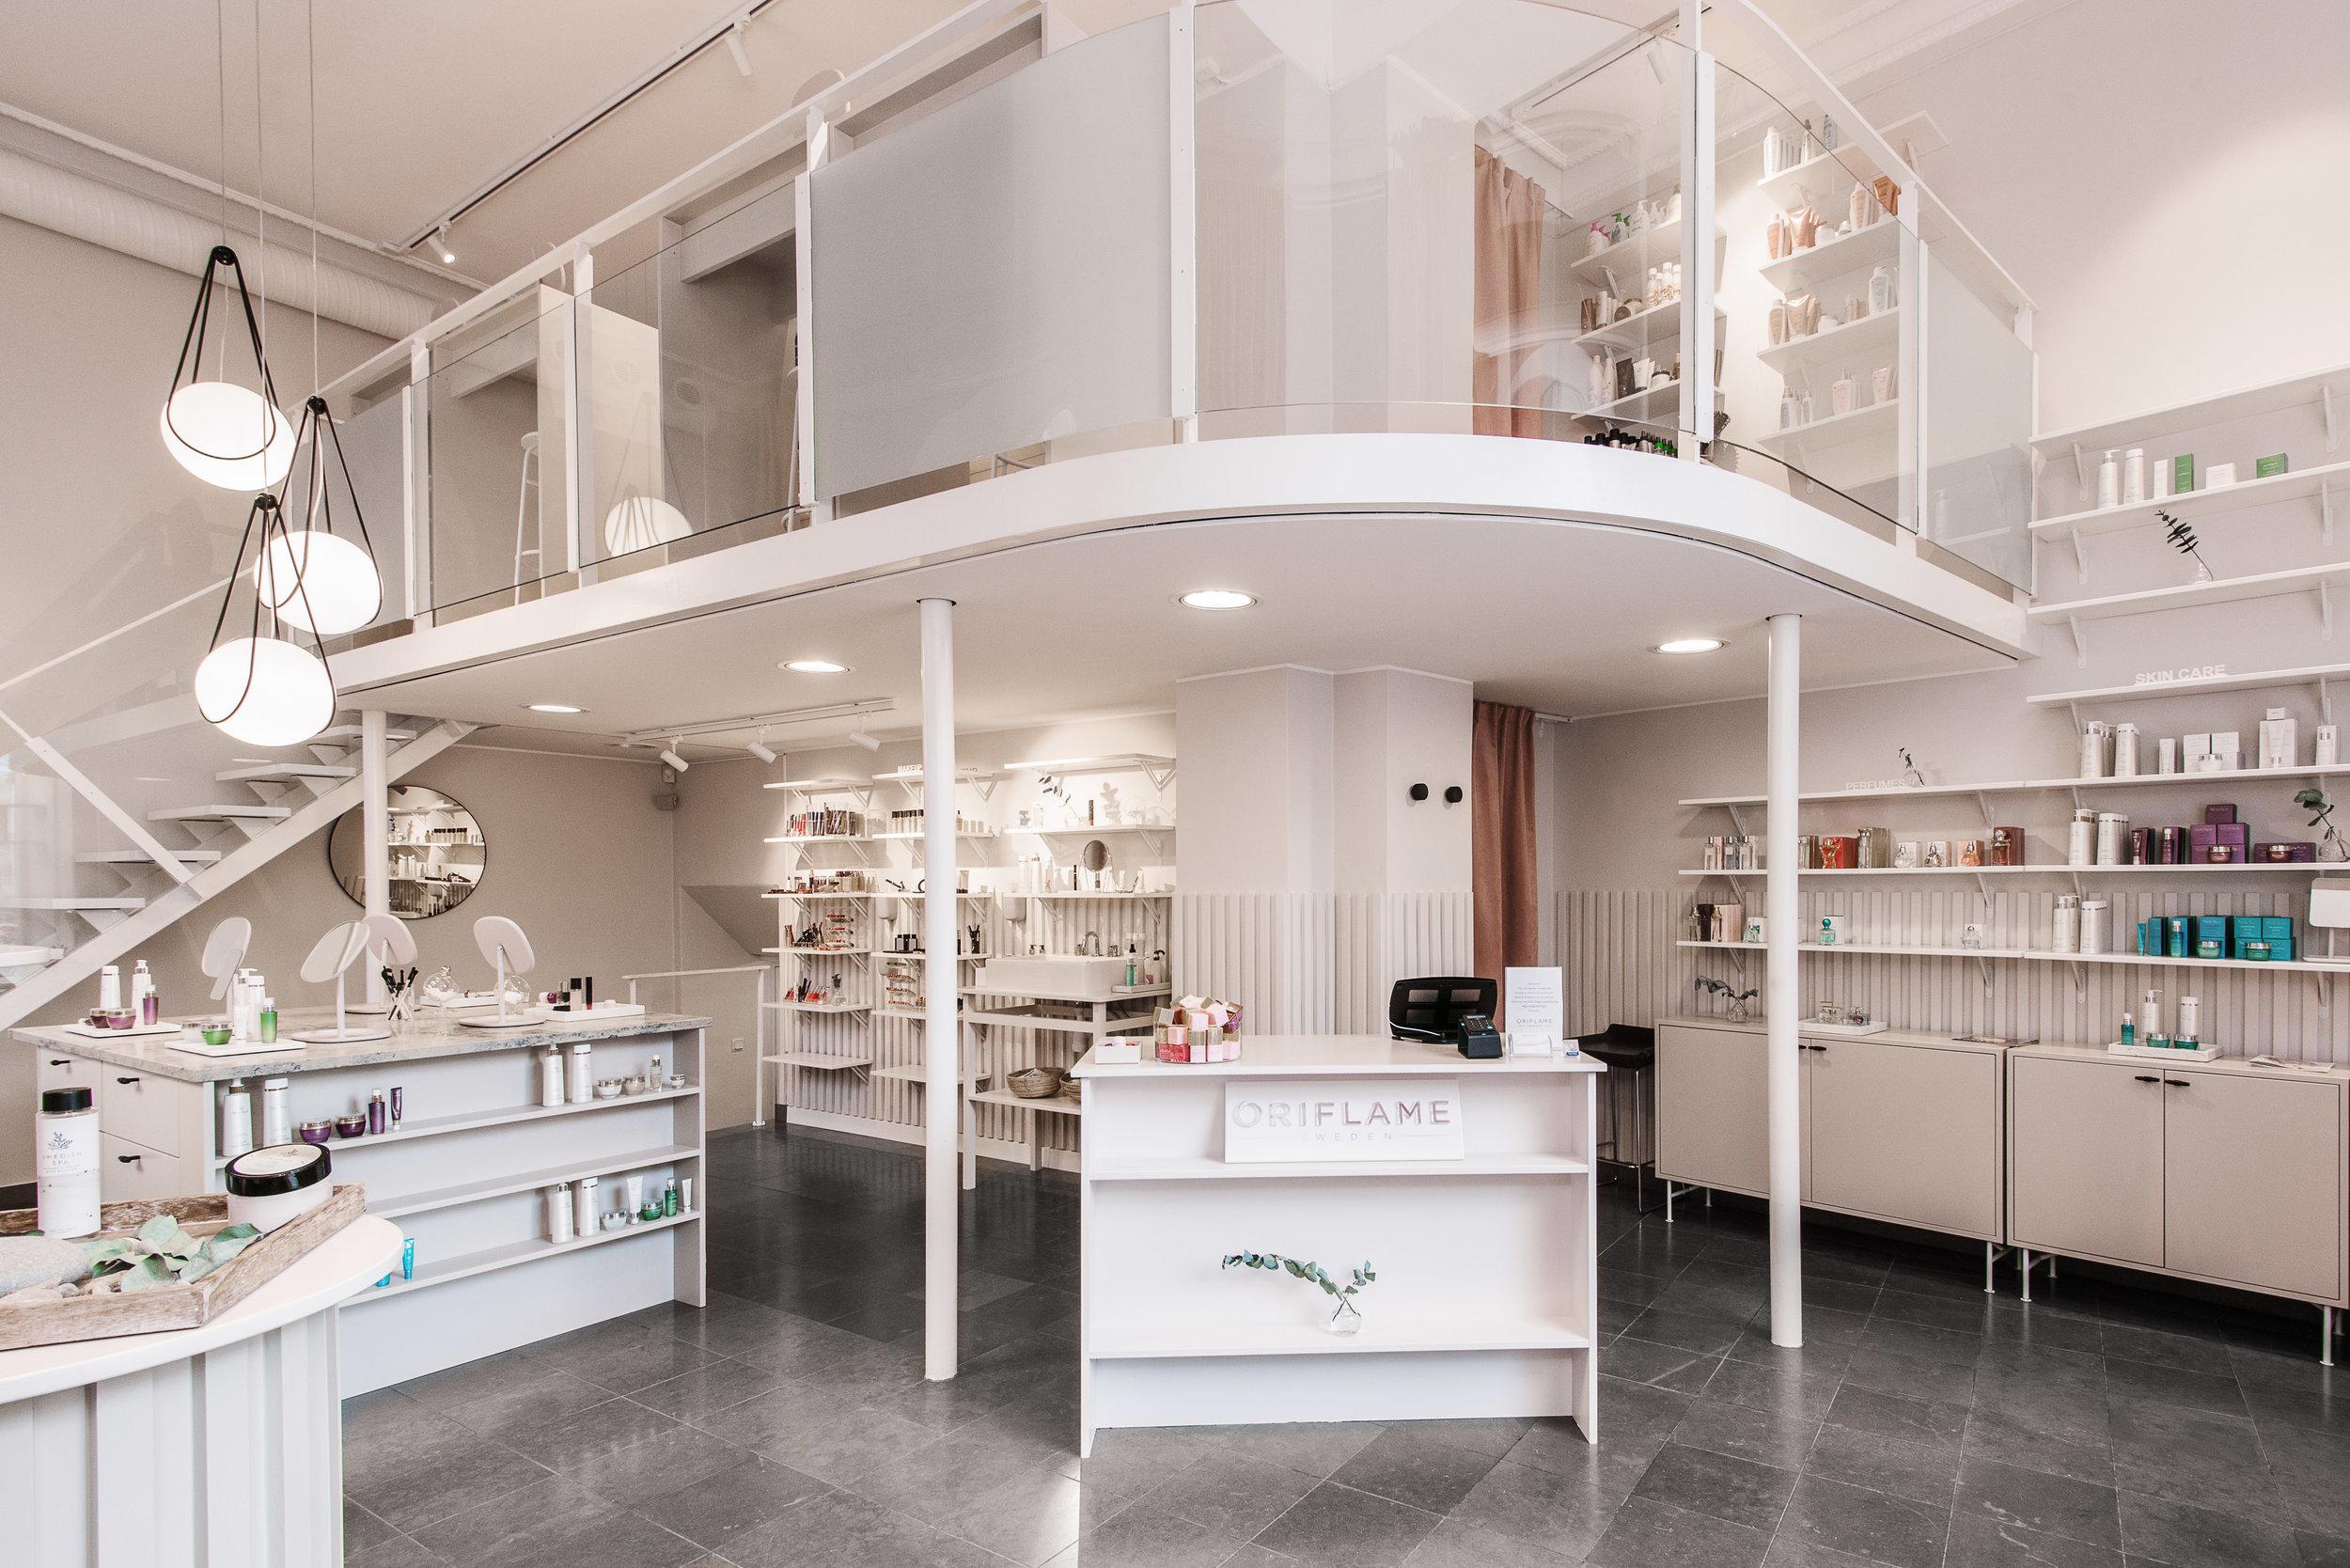 Inredningsarkitekt stockholm butik oriflame 3